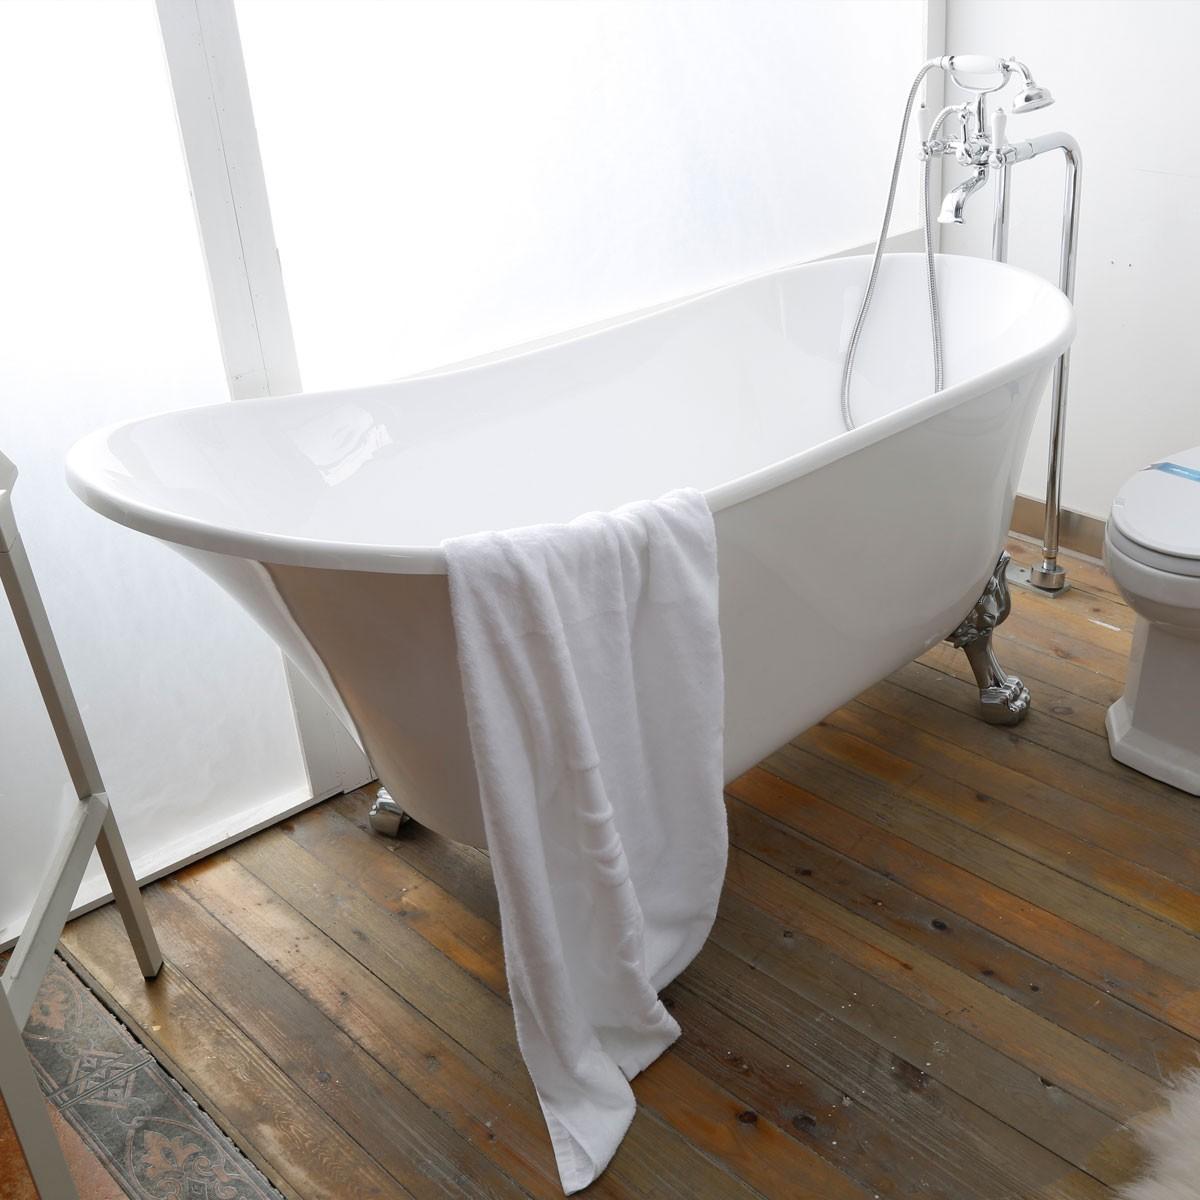 63 In Pure White Clawfoot Freestanding Bathtub (DK-PW-1675W ...